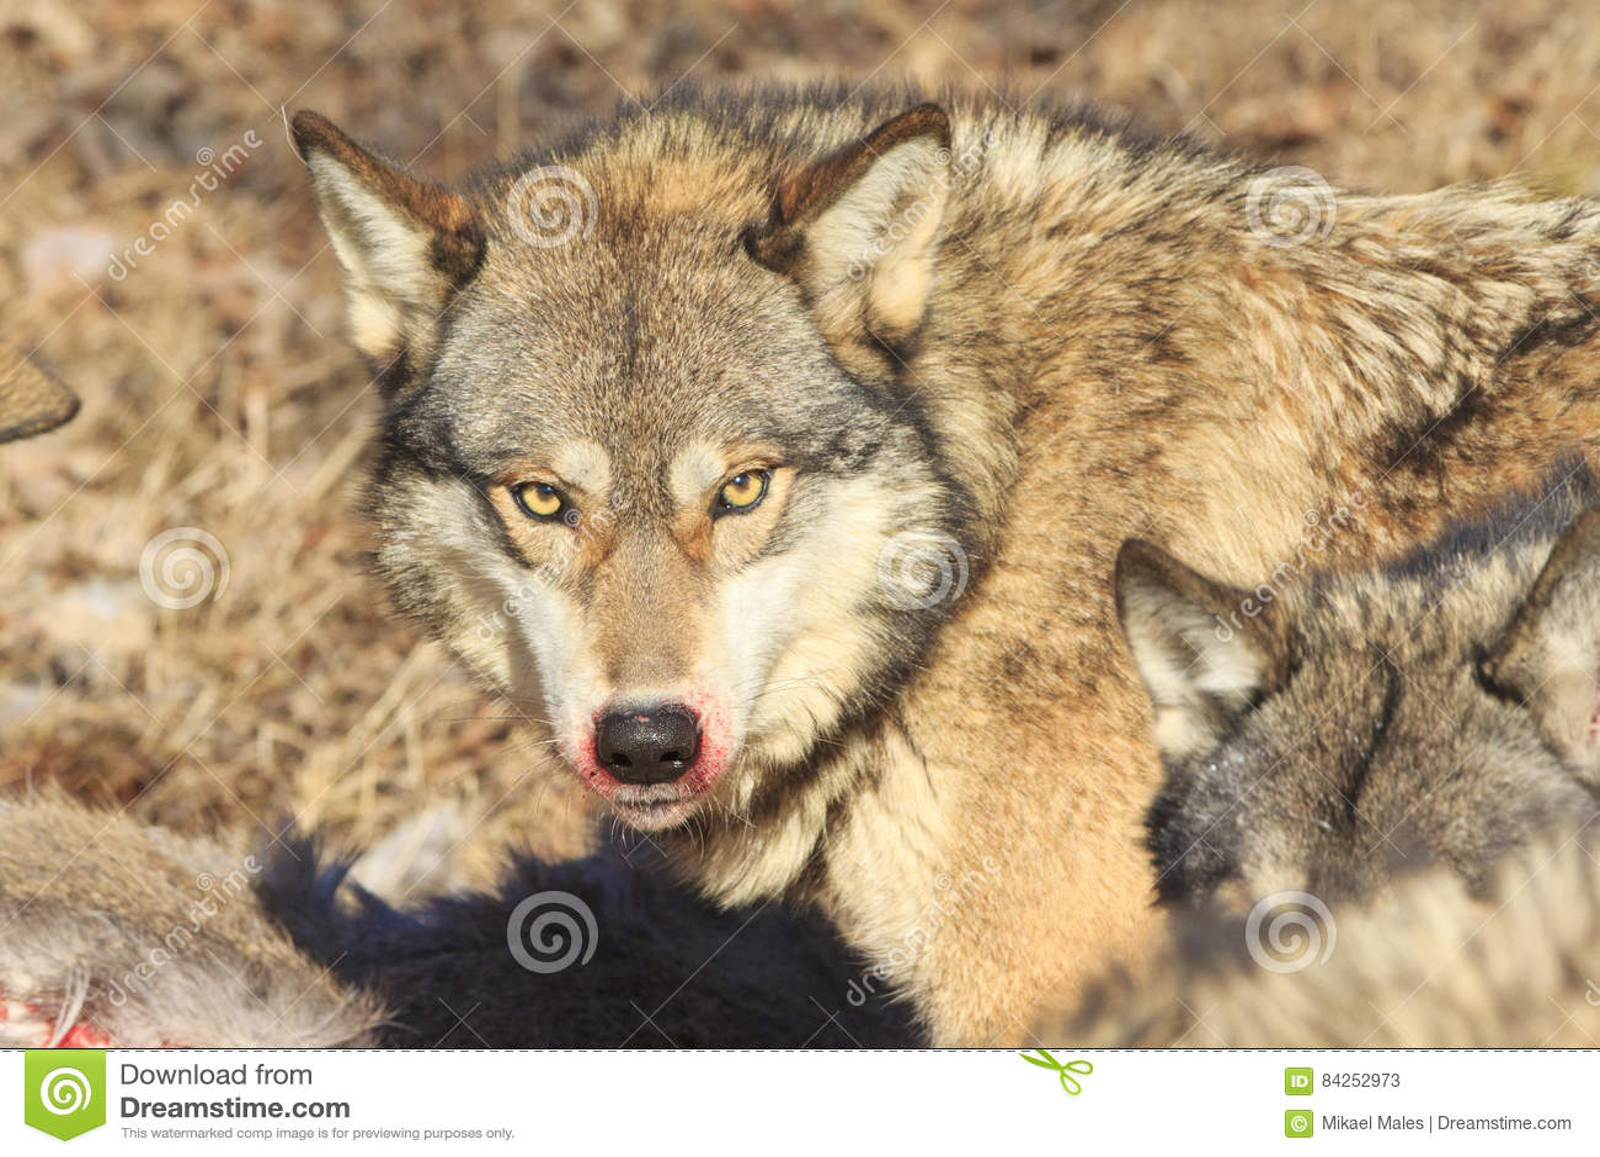 Download Bloody mane of wolf stock image. Image of feeding, predator - 84252973